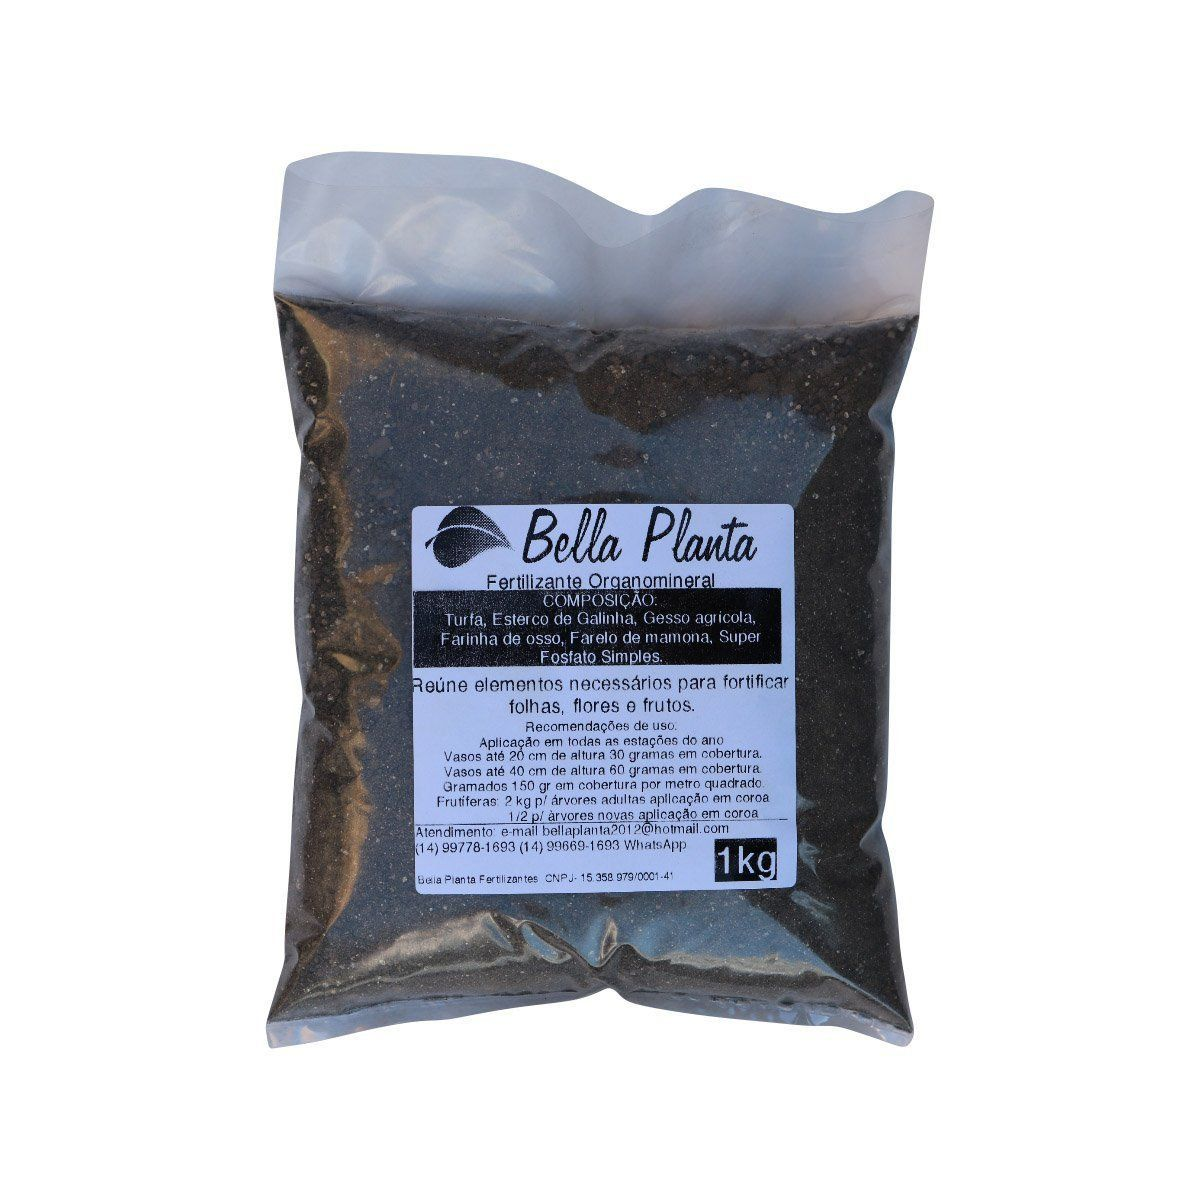 Fertilizante organomineral Classe A Bella Planta 1Kg